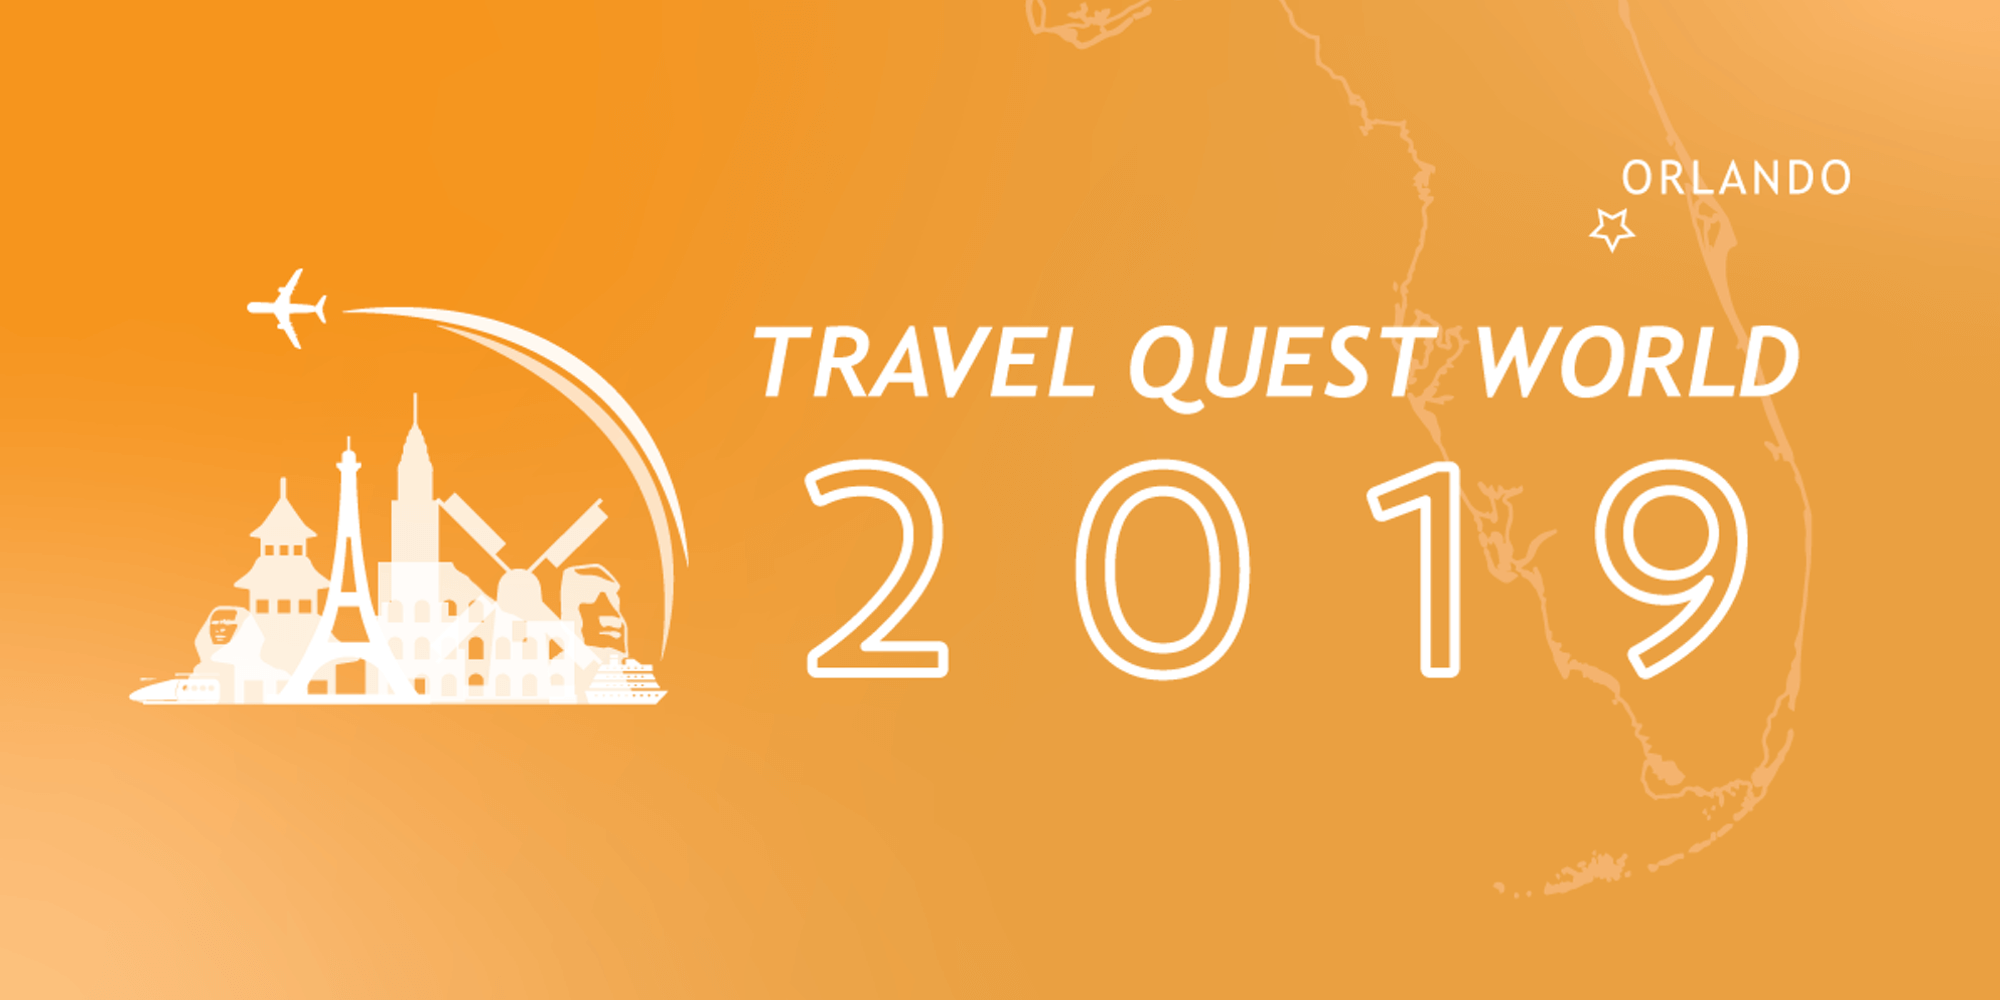 Travel Quest World 2019